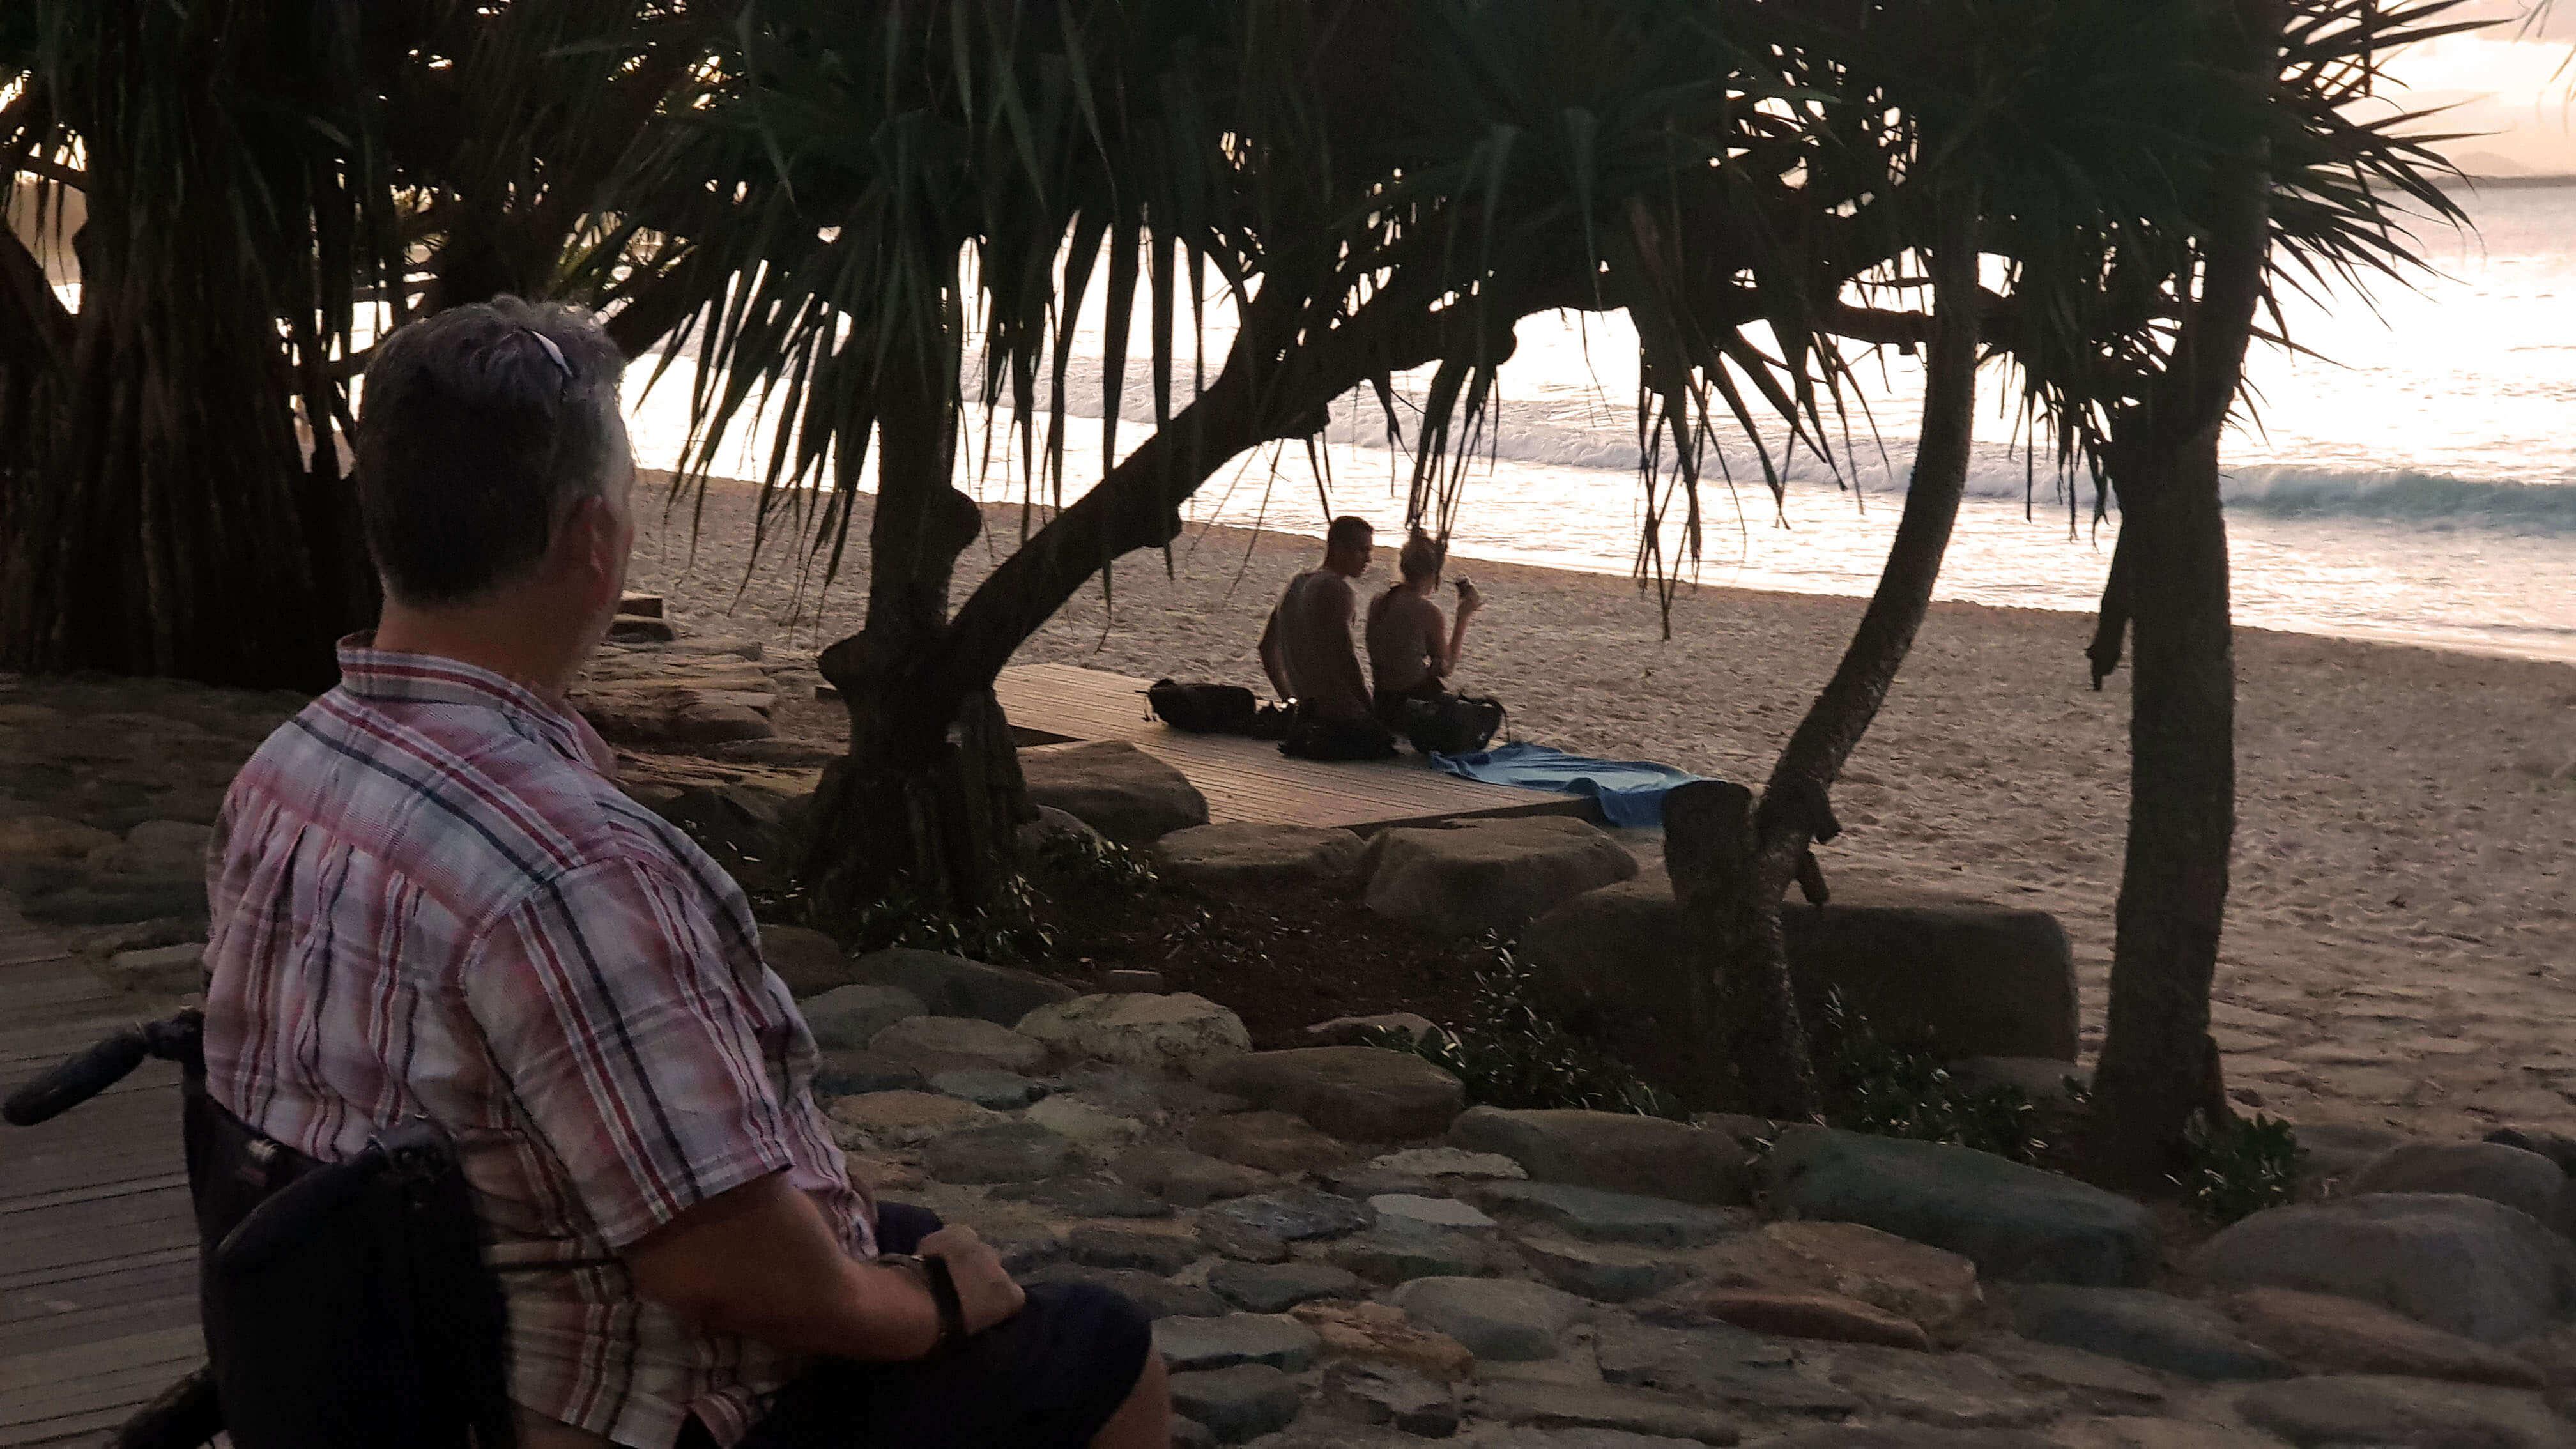 Man in Wheelchair looking over beach